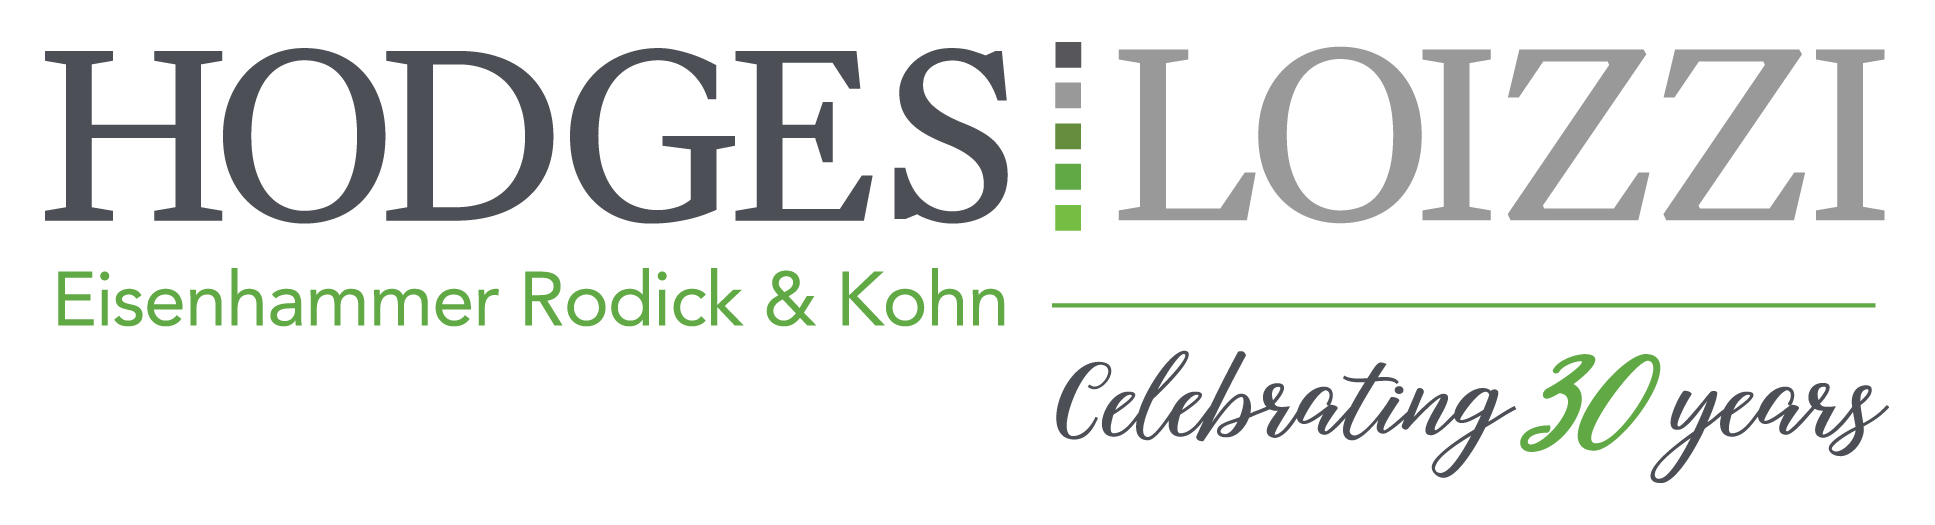 Hodges, Loizzi, Eisenhammer, Rodick & Kohn